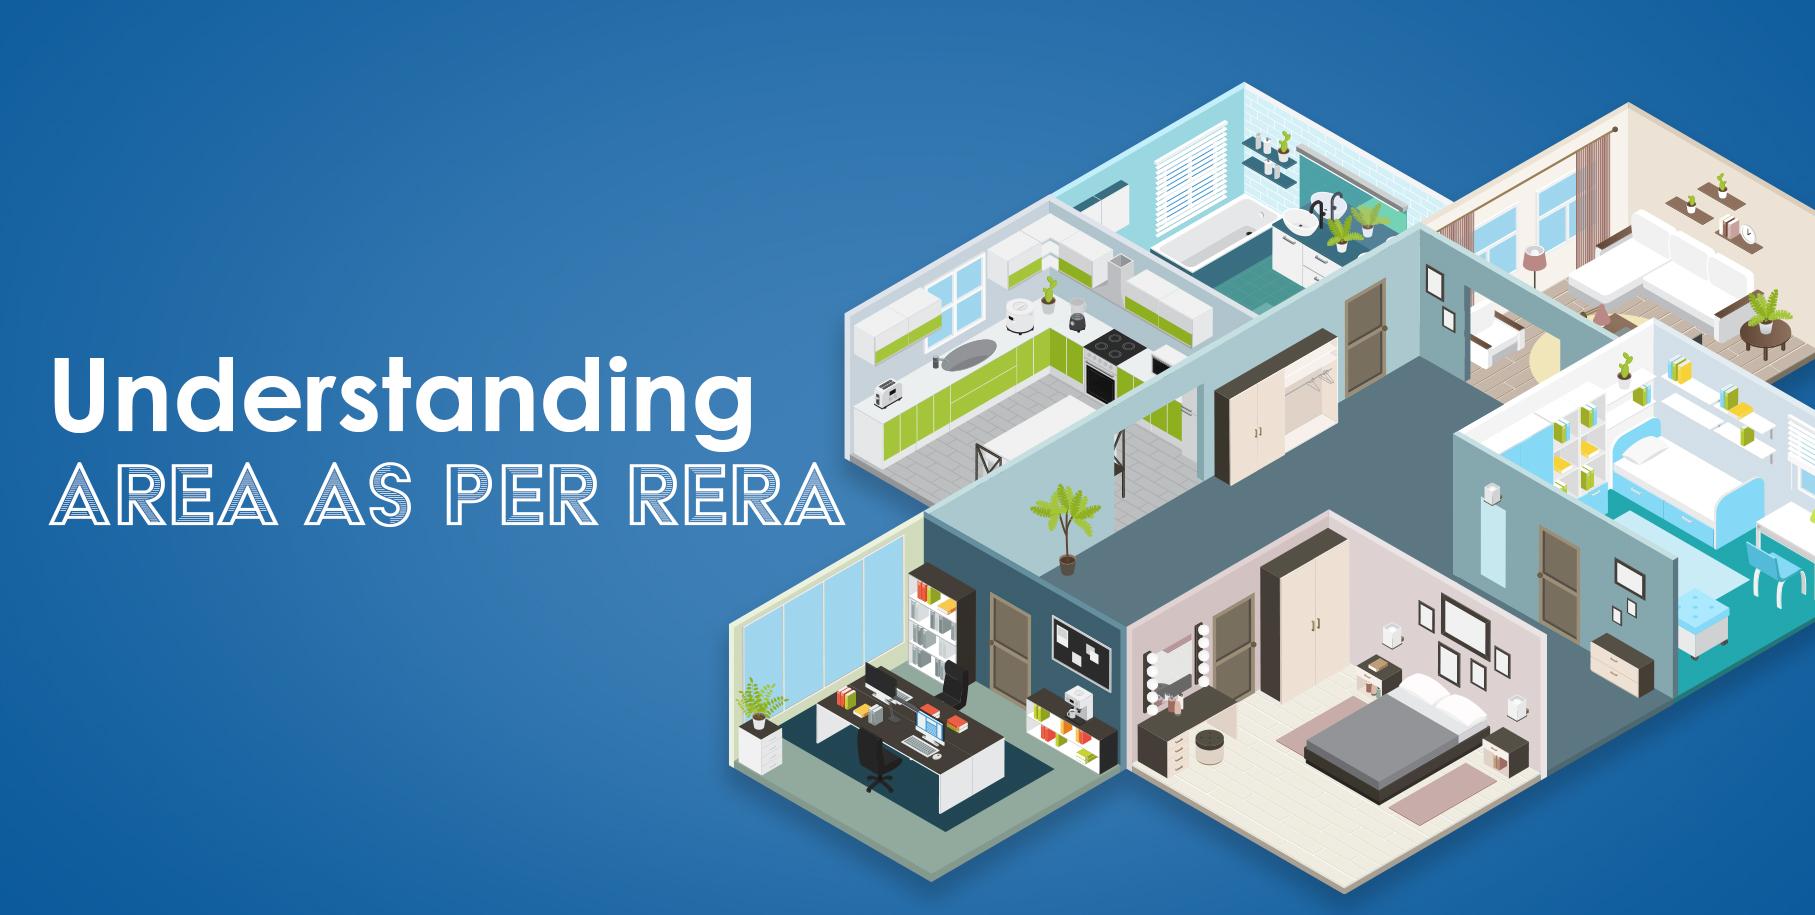 Understanding Area as per RERA